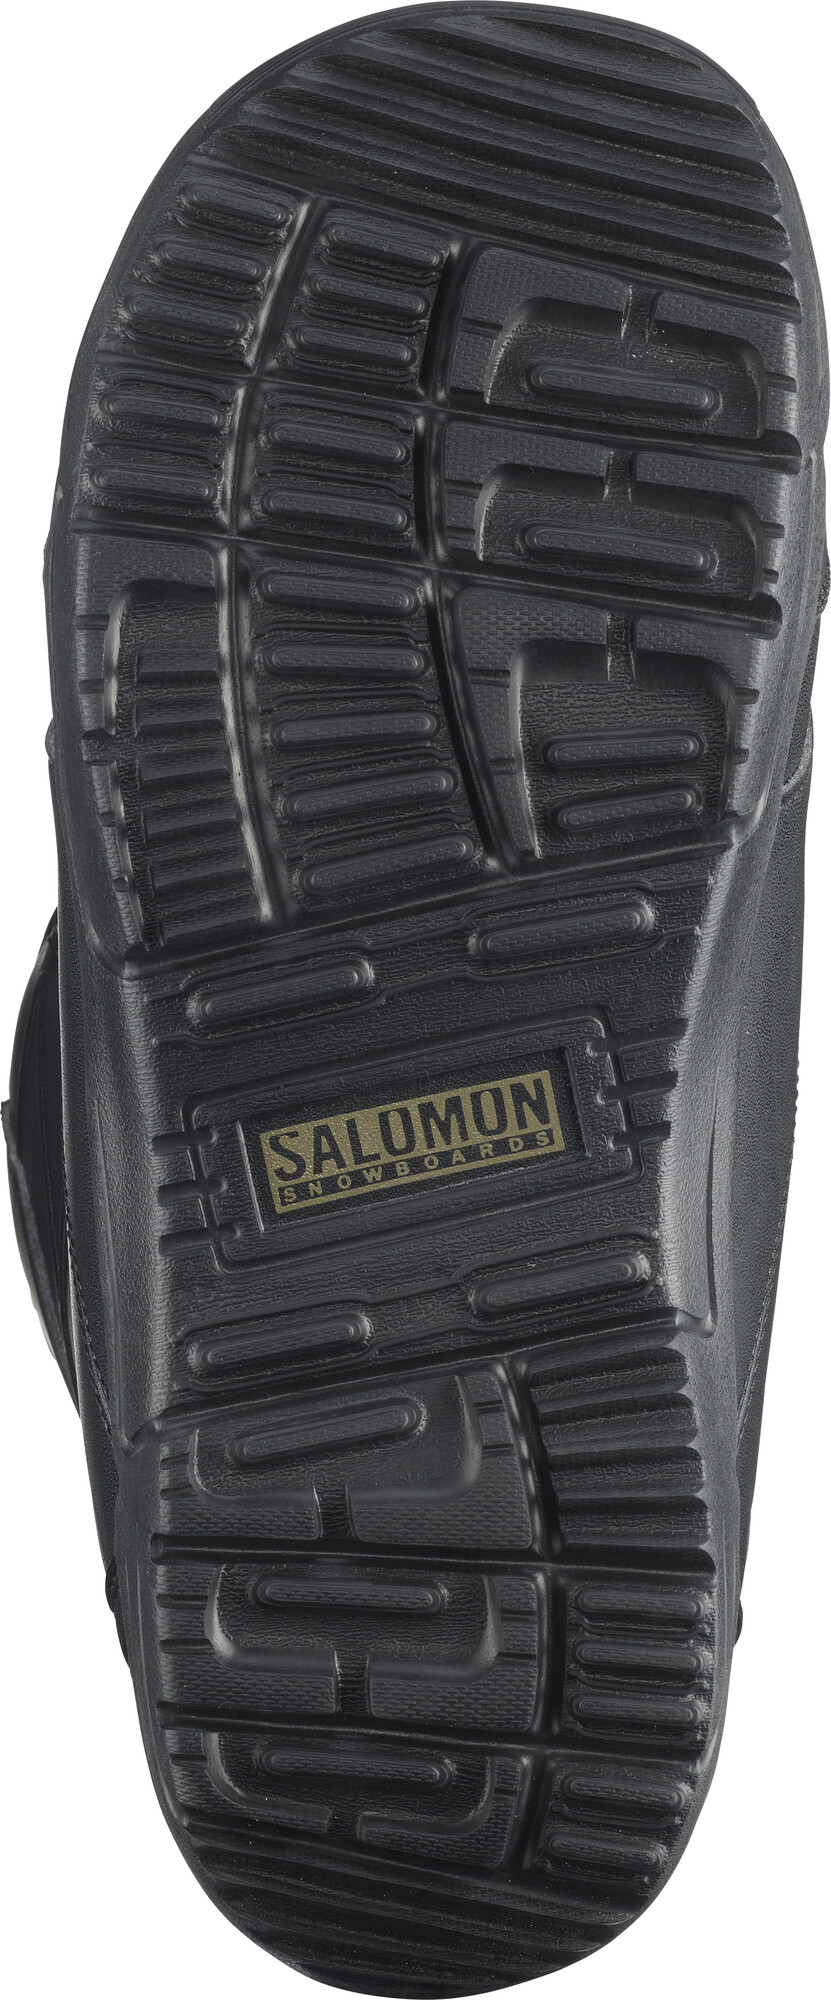 Salomon M Faction Boa 2020